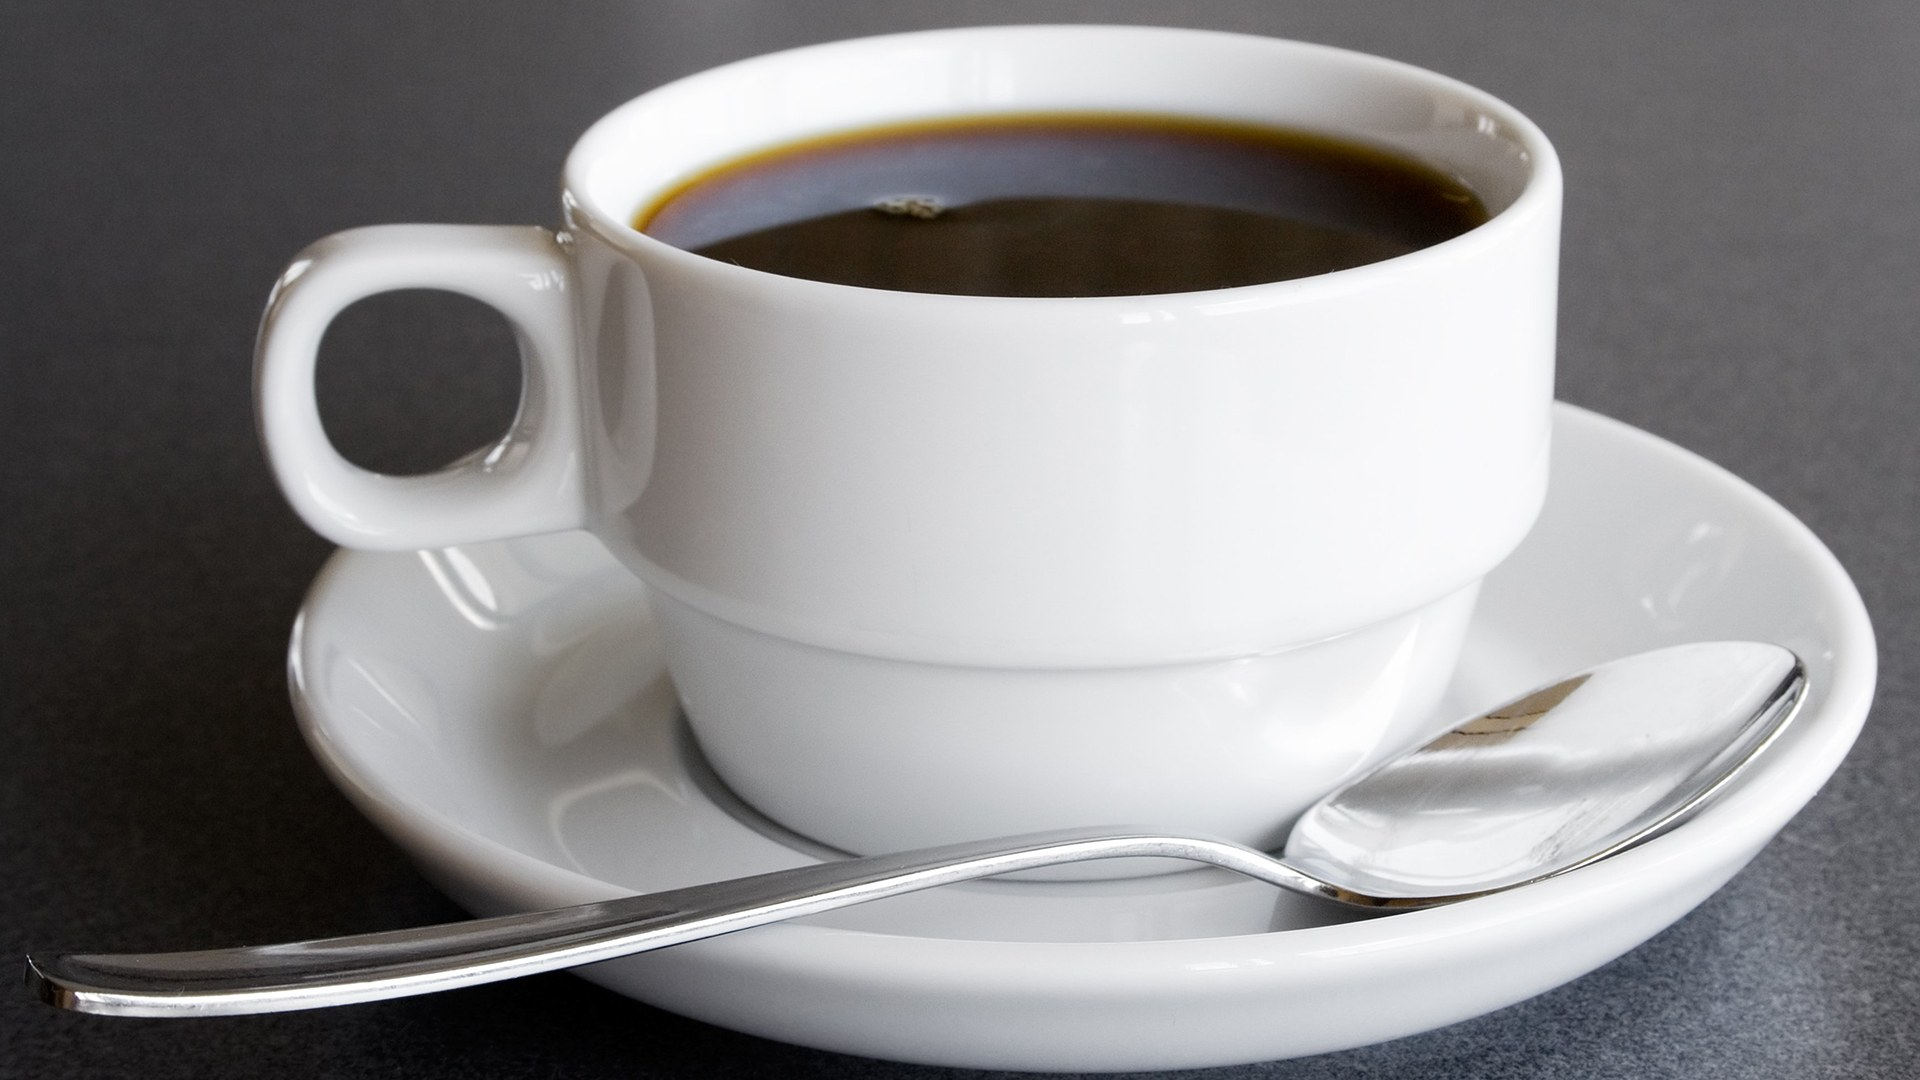 Amazing Health Benefits Of Coffee